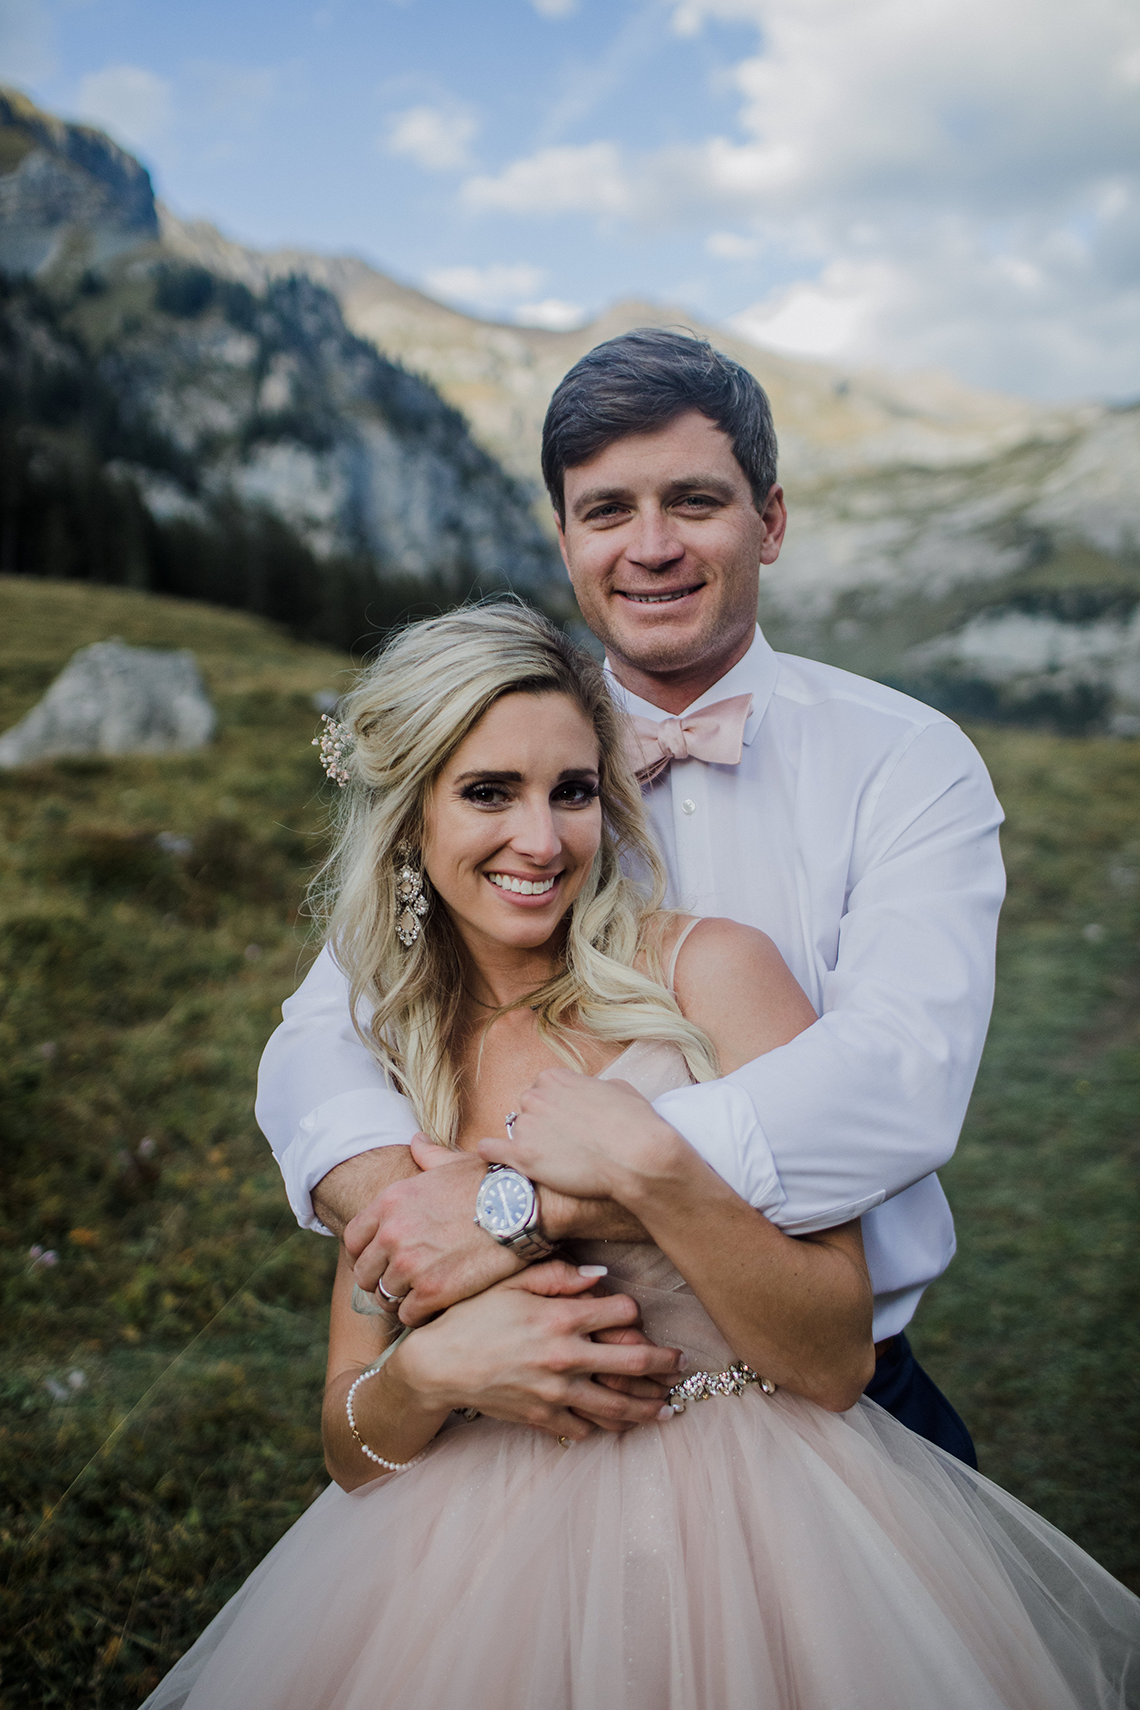 Amazing Adventurous Swiss Alps Mountain Wedding – Unveiled Radiance Photography 68